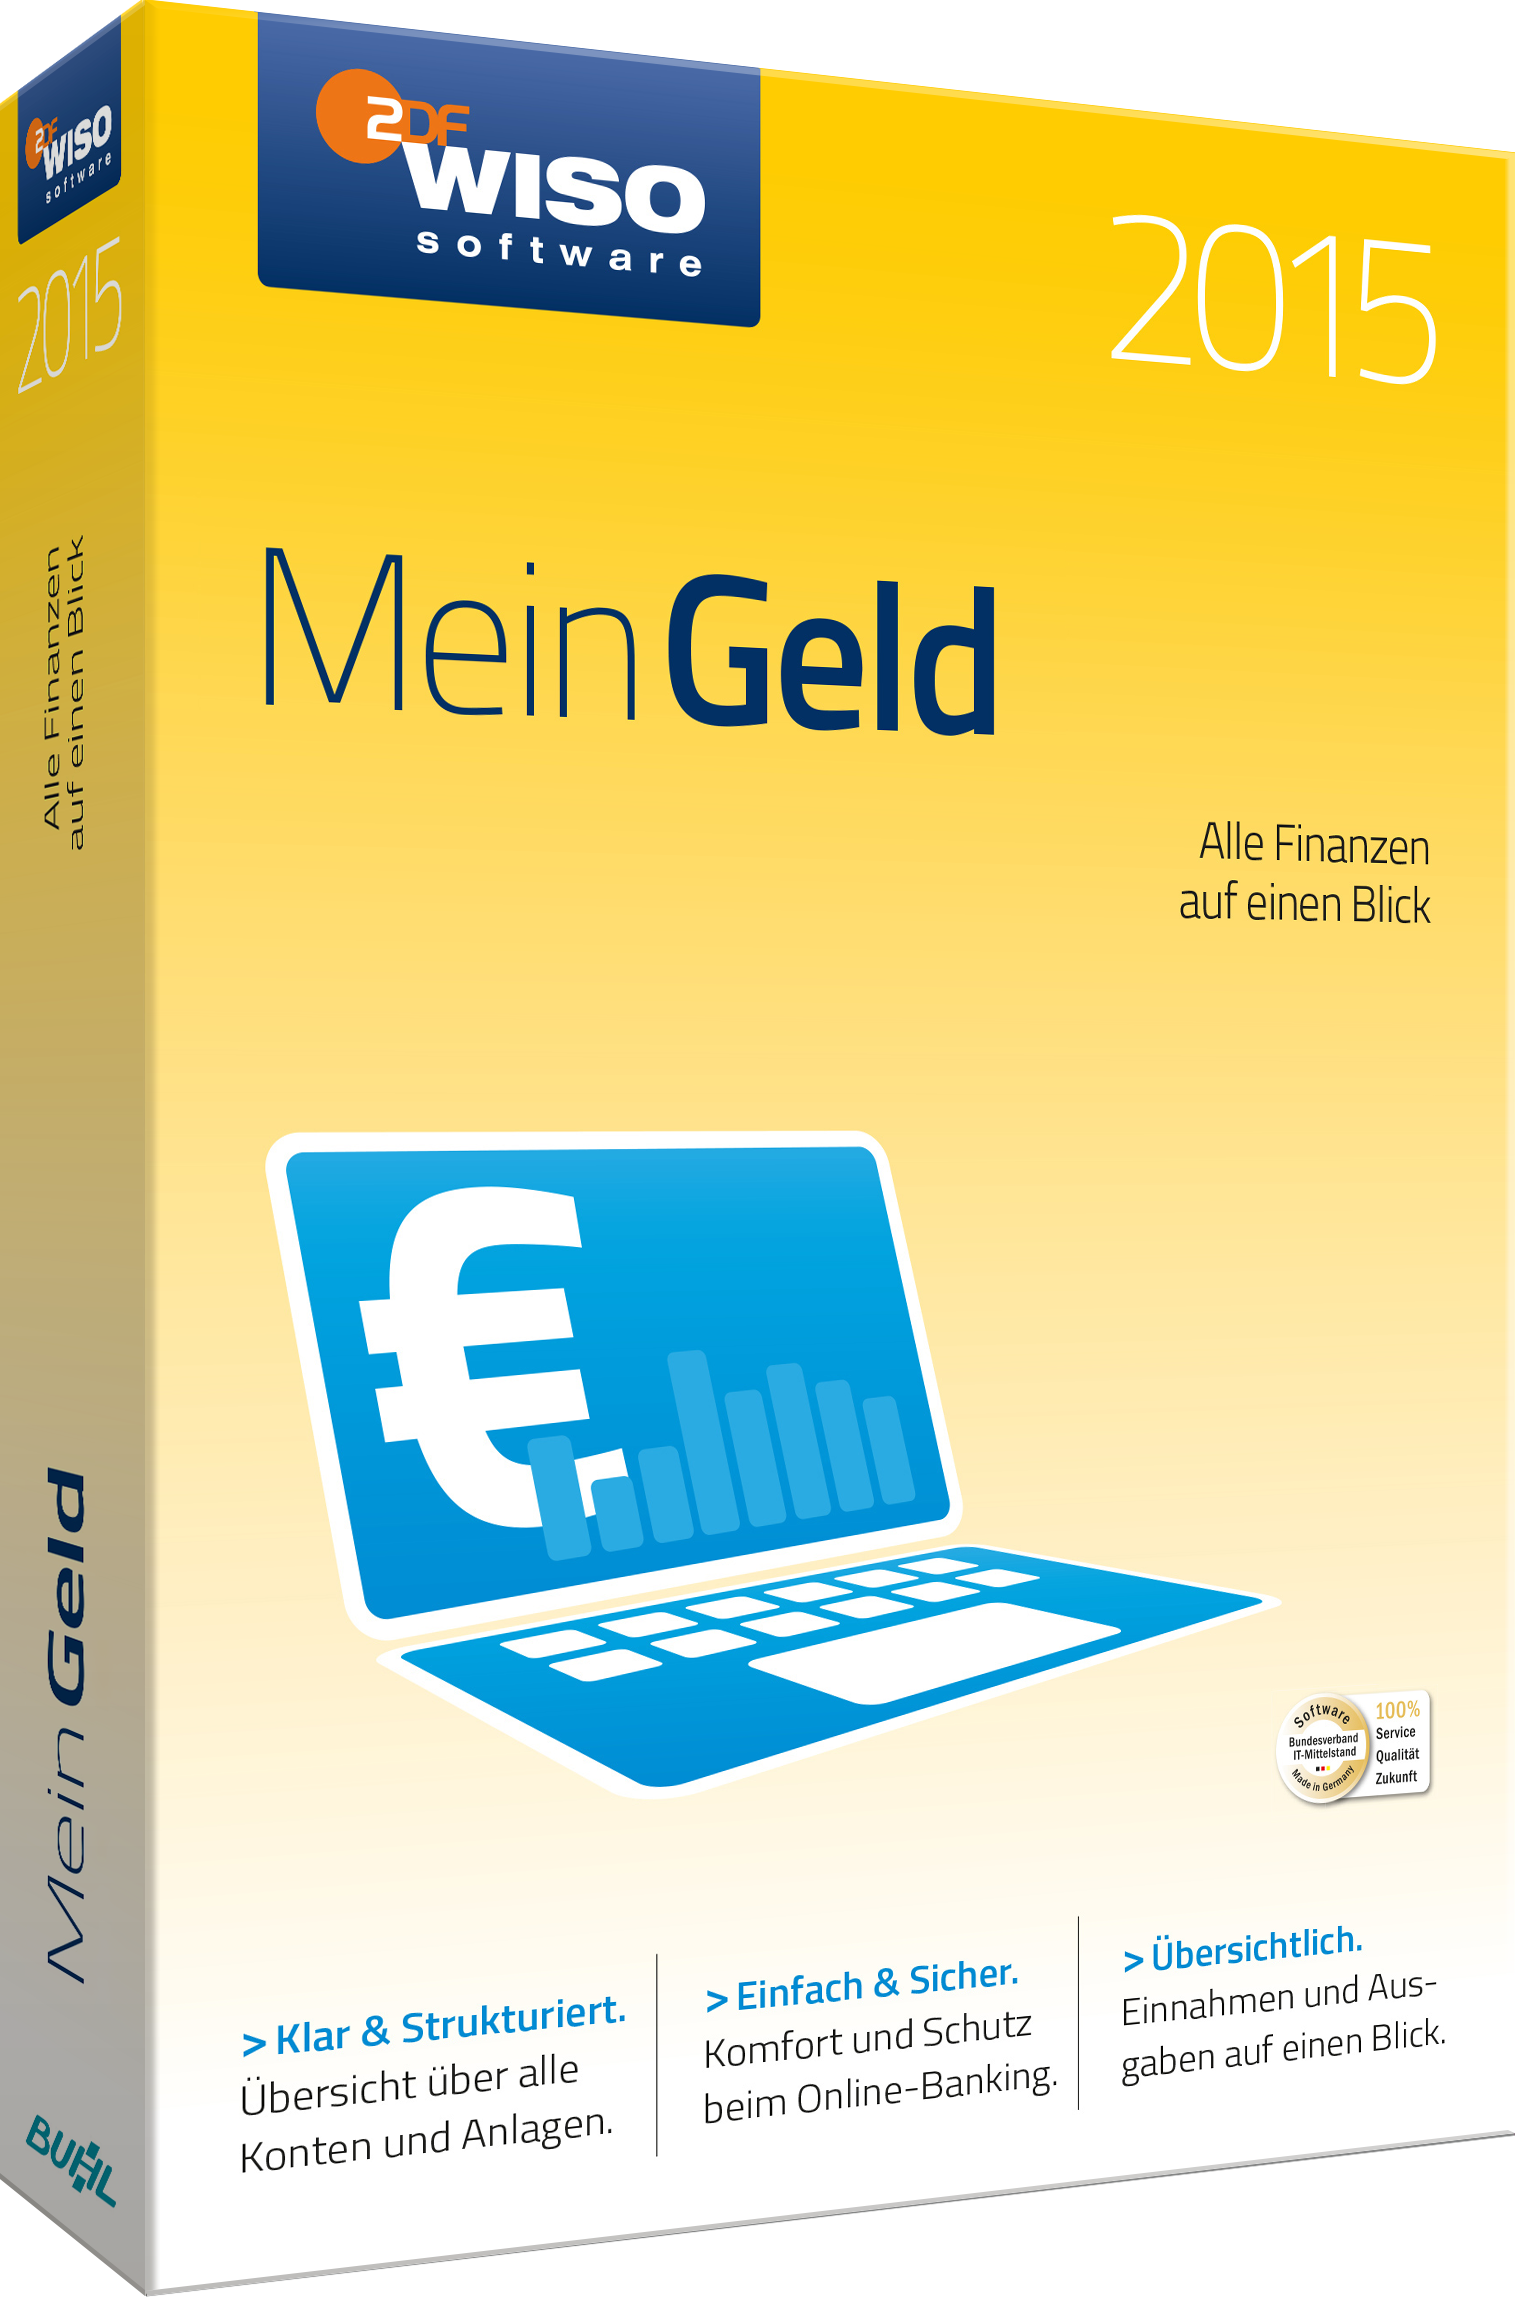 WISO Mein Geld 2015 Standard